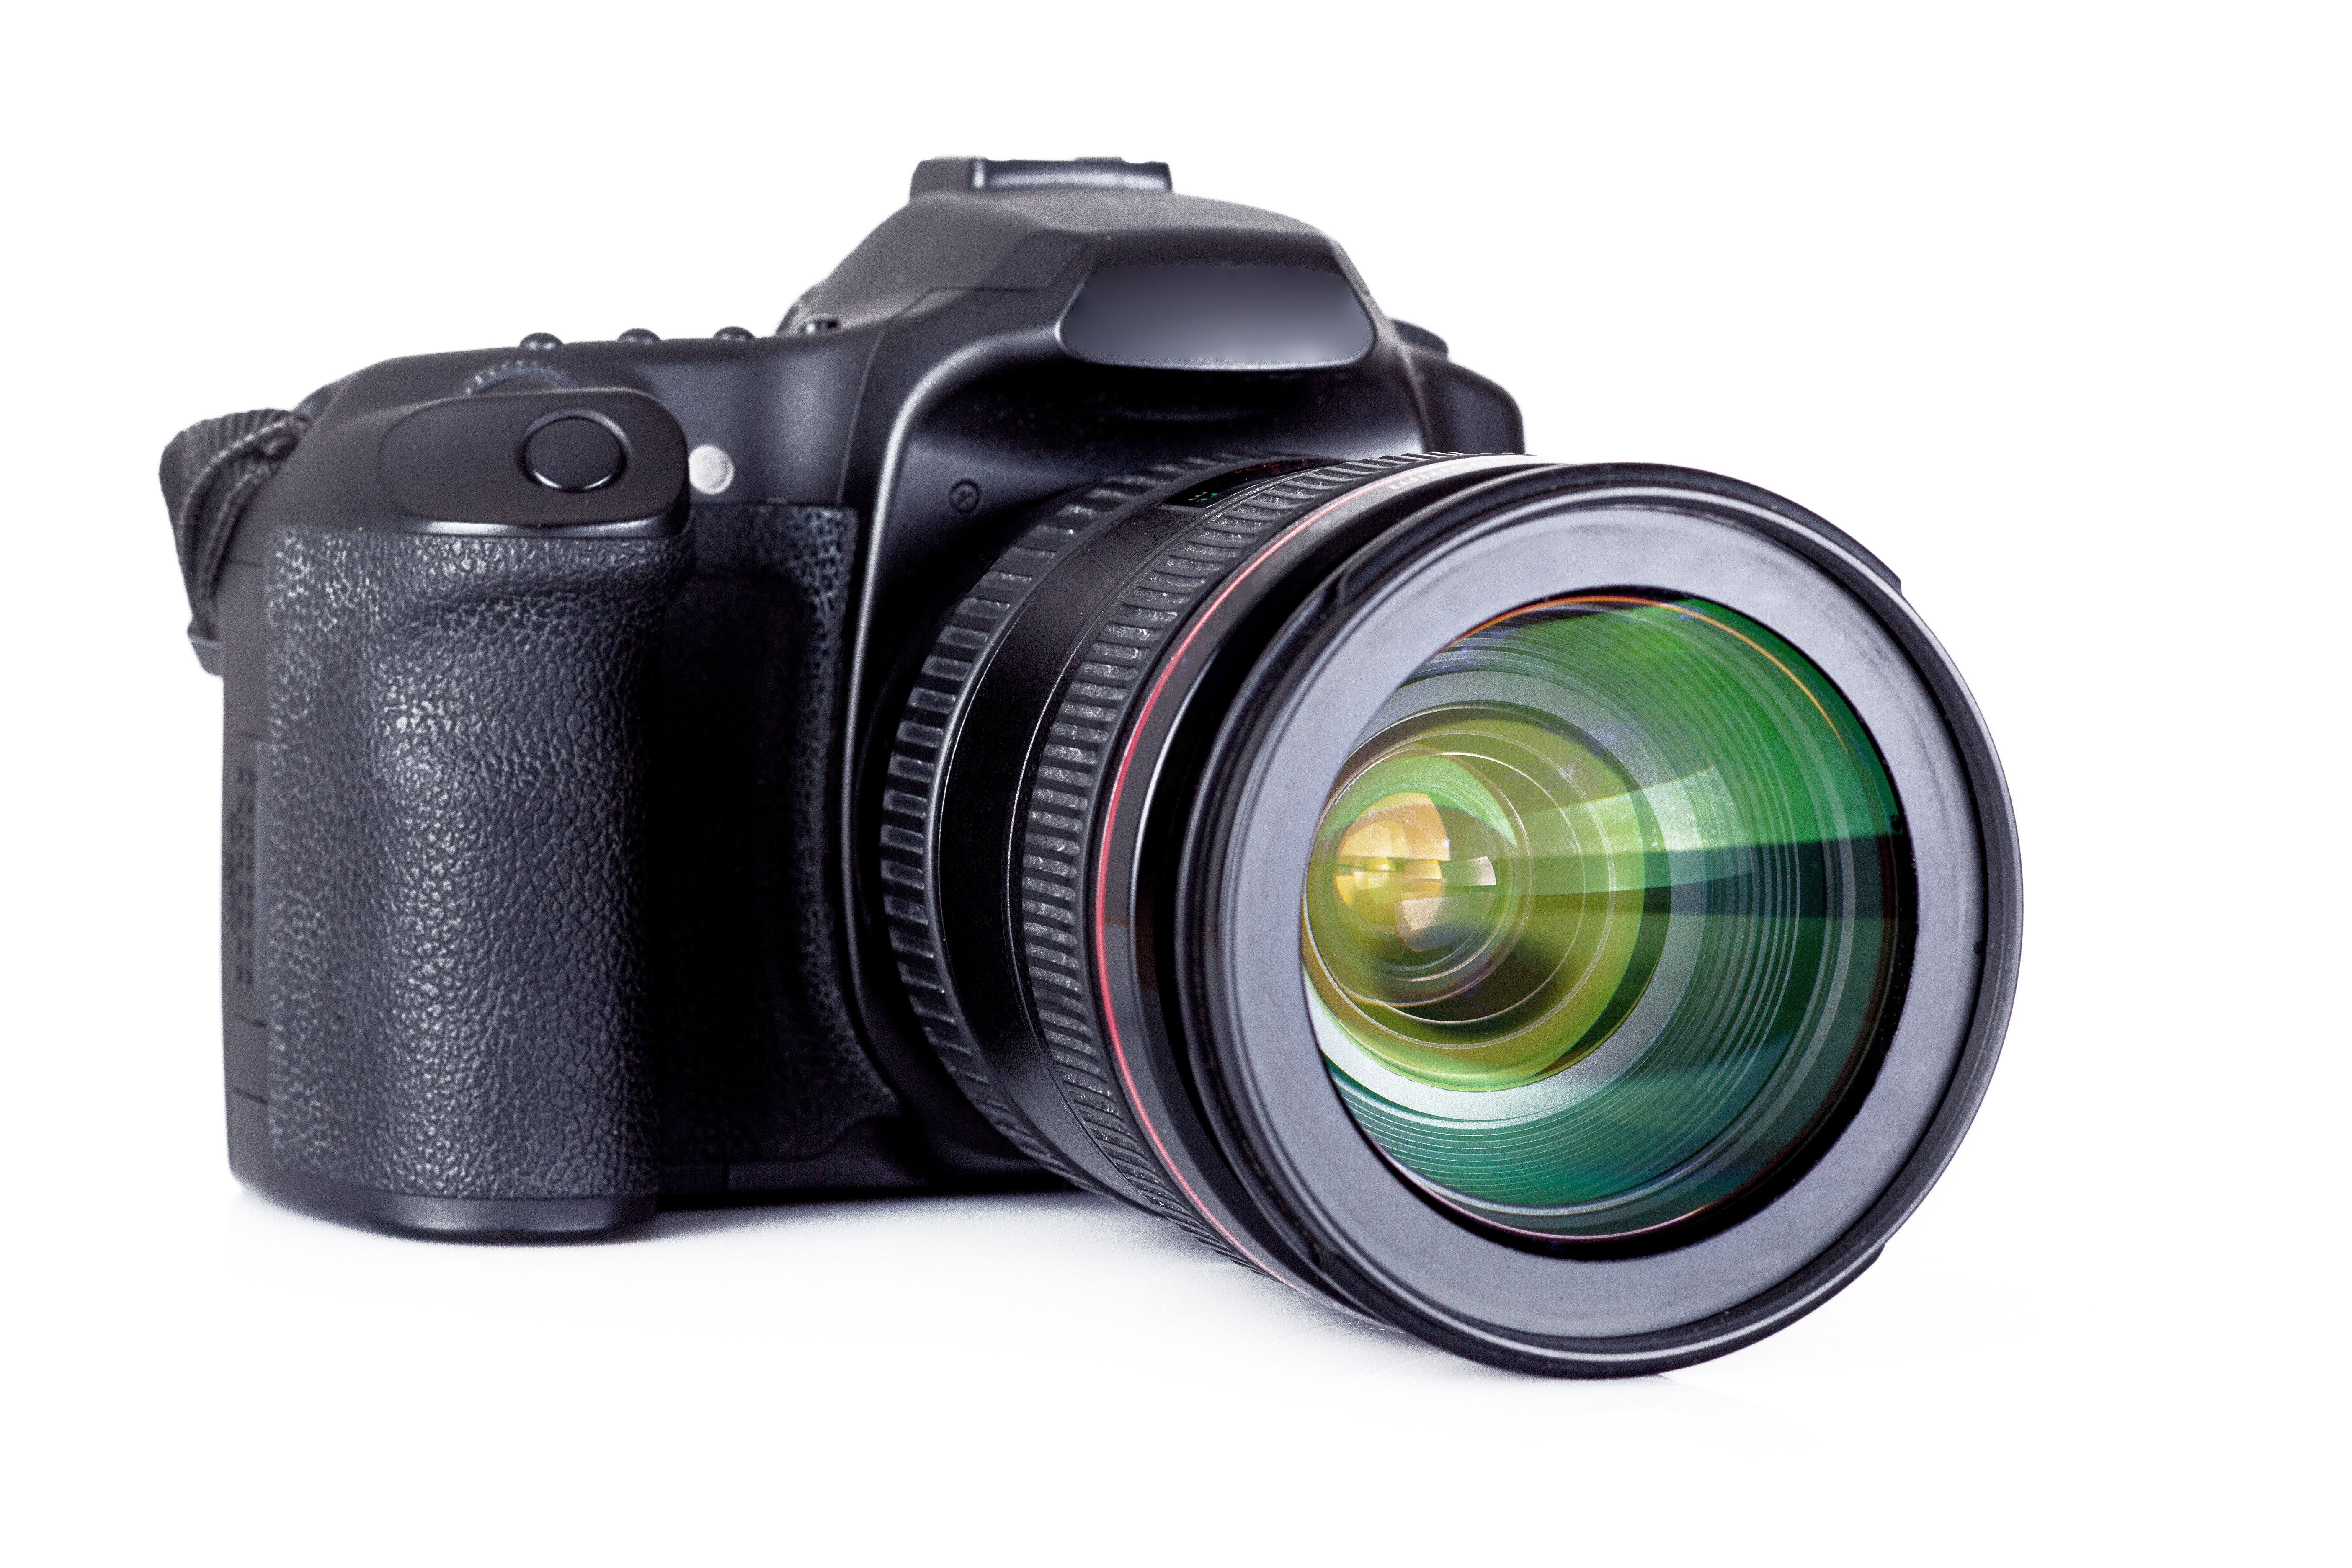 Kameratyp: Digitale Spiegelreflexkamera